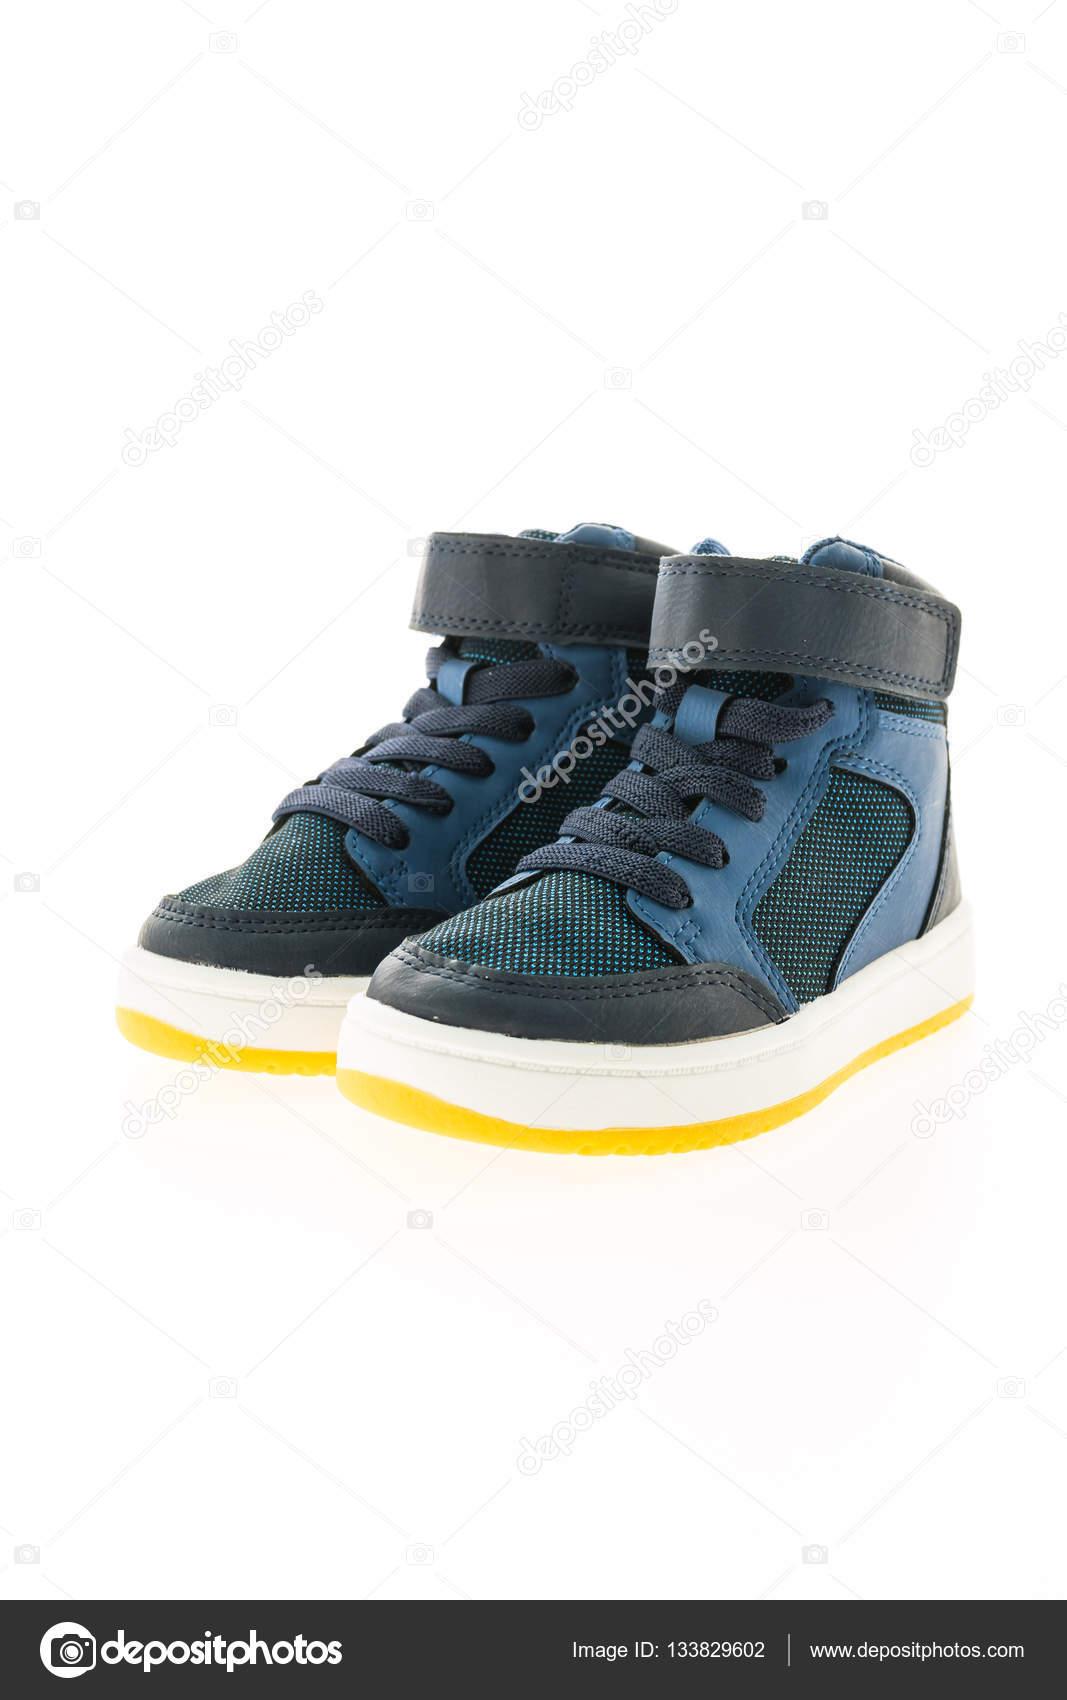 b50ff8bea02 Μόδα παπούτσια και αθλητικά — Φωτογραφία Αρχείου © mrsiraphol #133829602